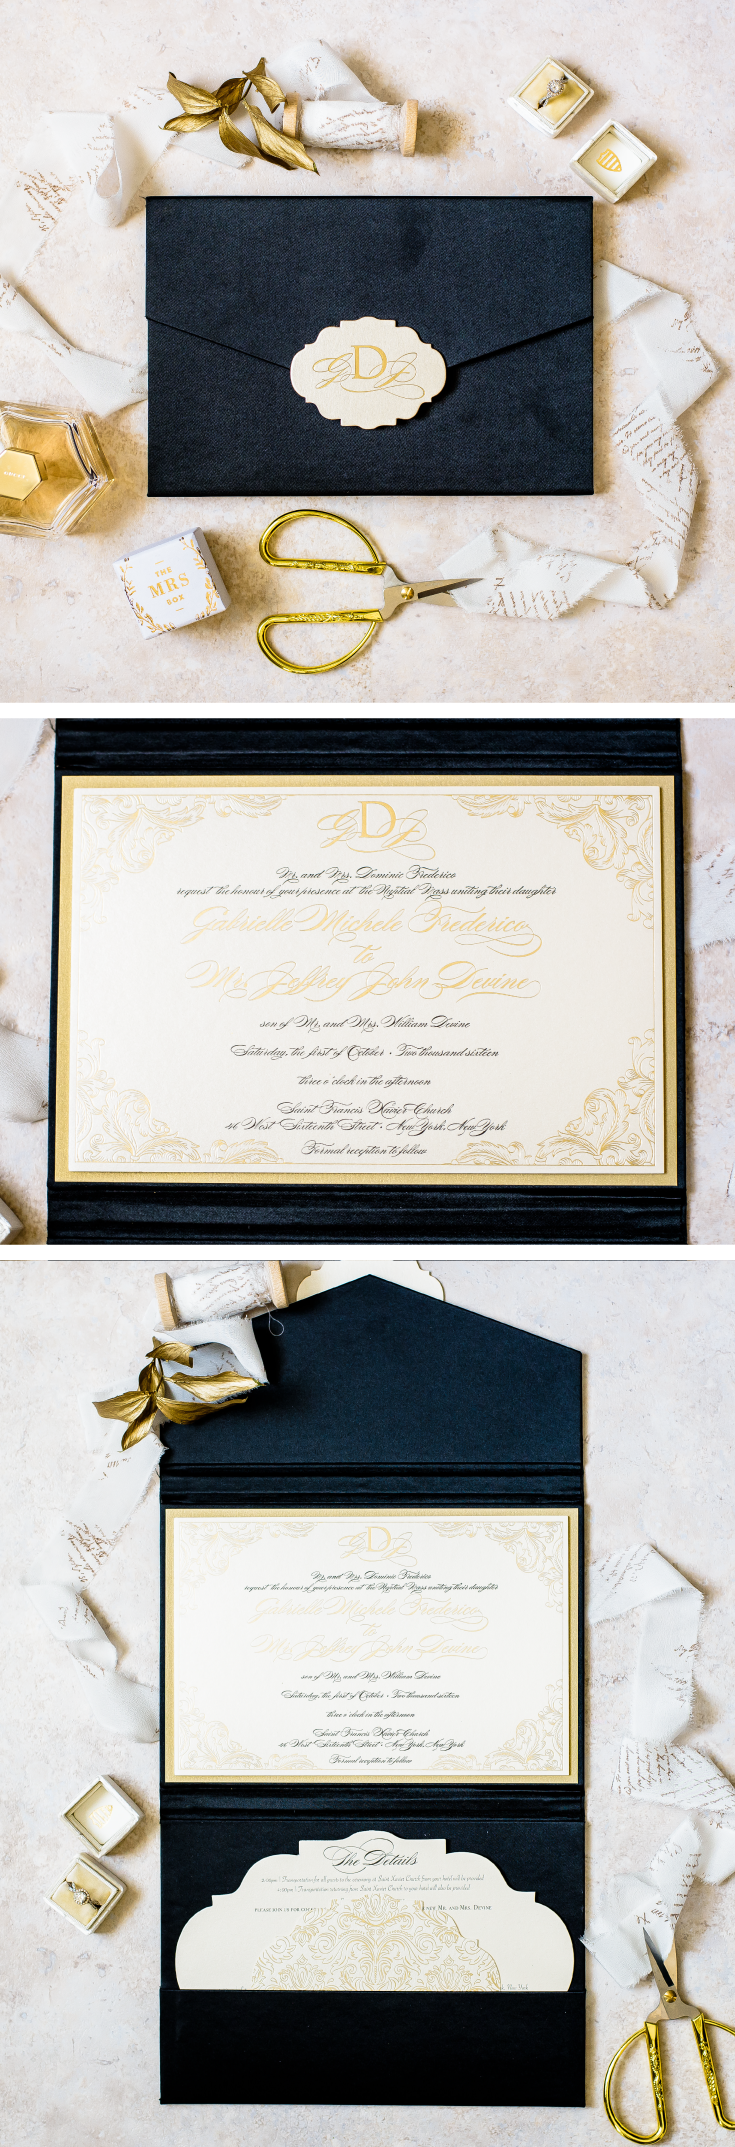 Home   Invitation design, Wedding and Weddings